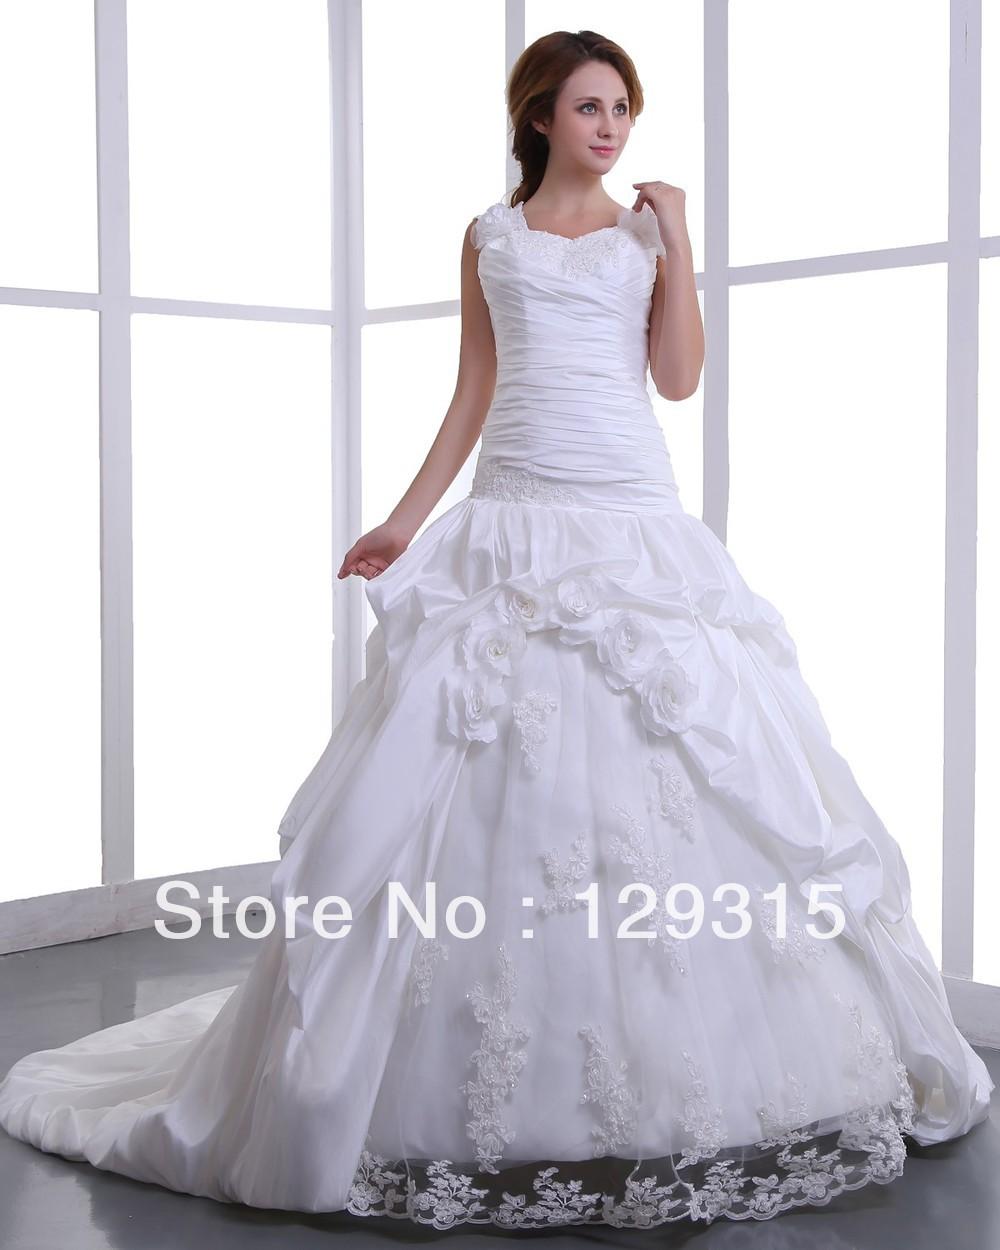 Modern wedding dresses indian dresses wedding decoration 201212278080(China (Mainland))